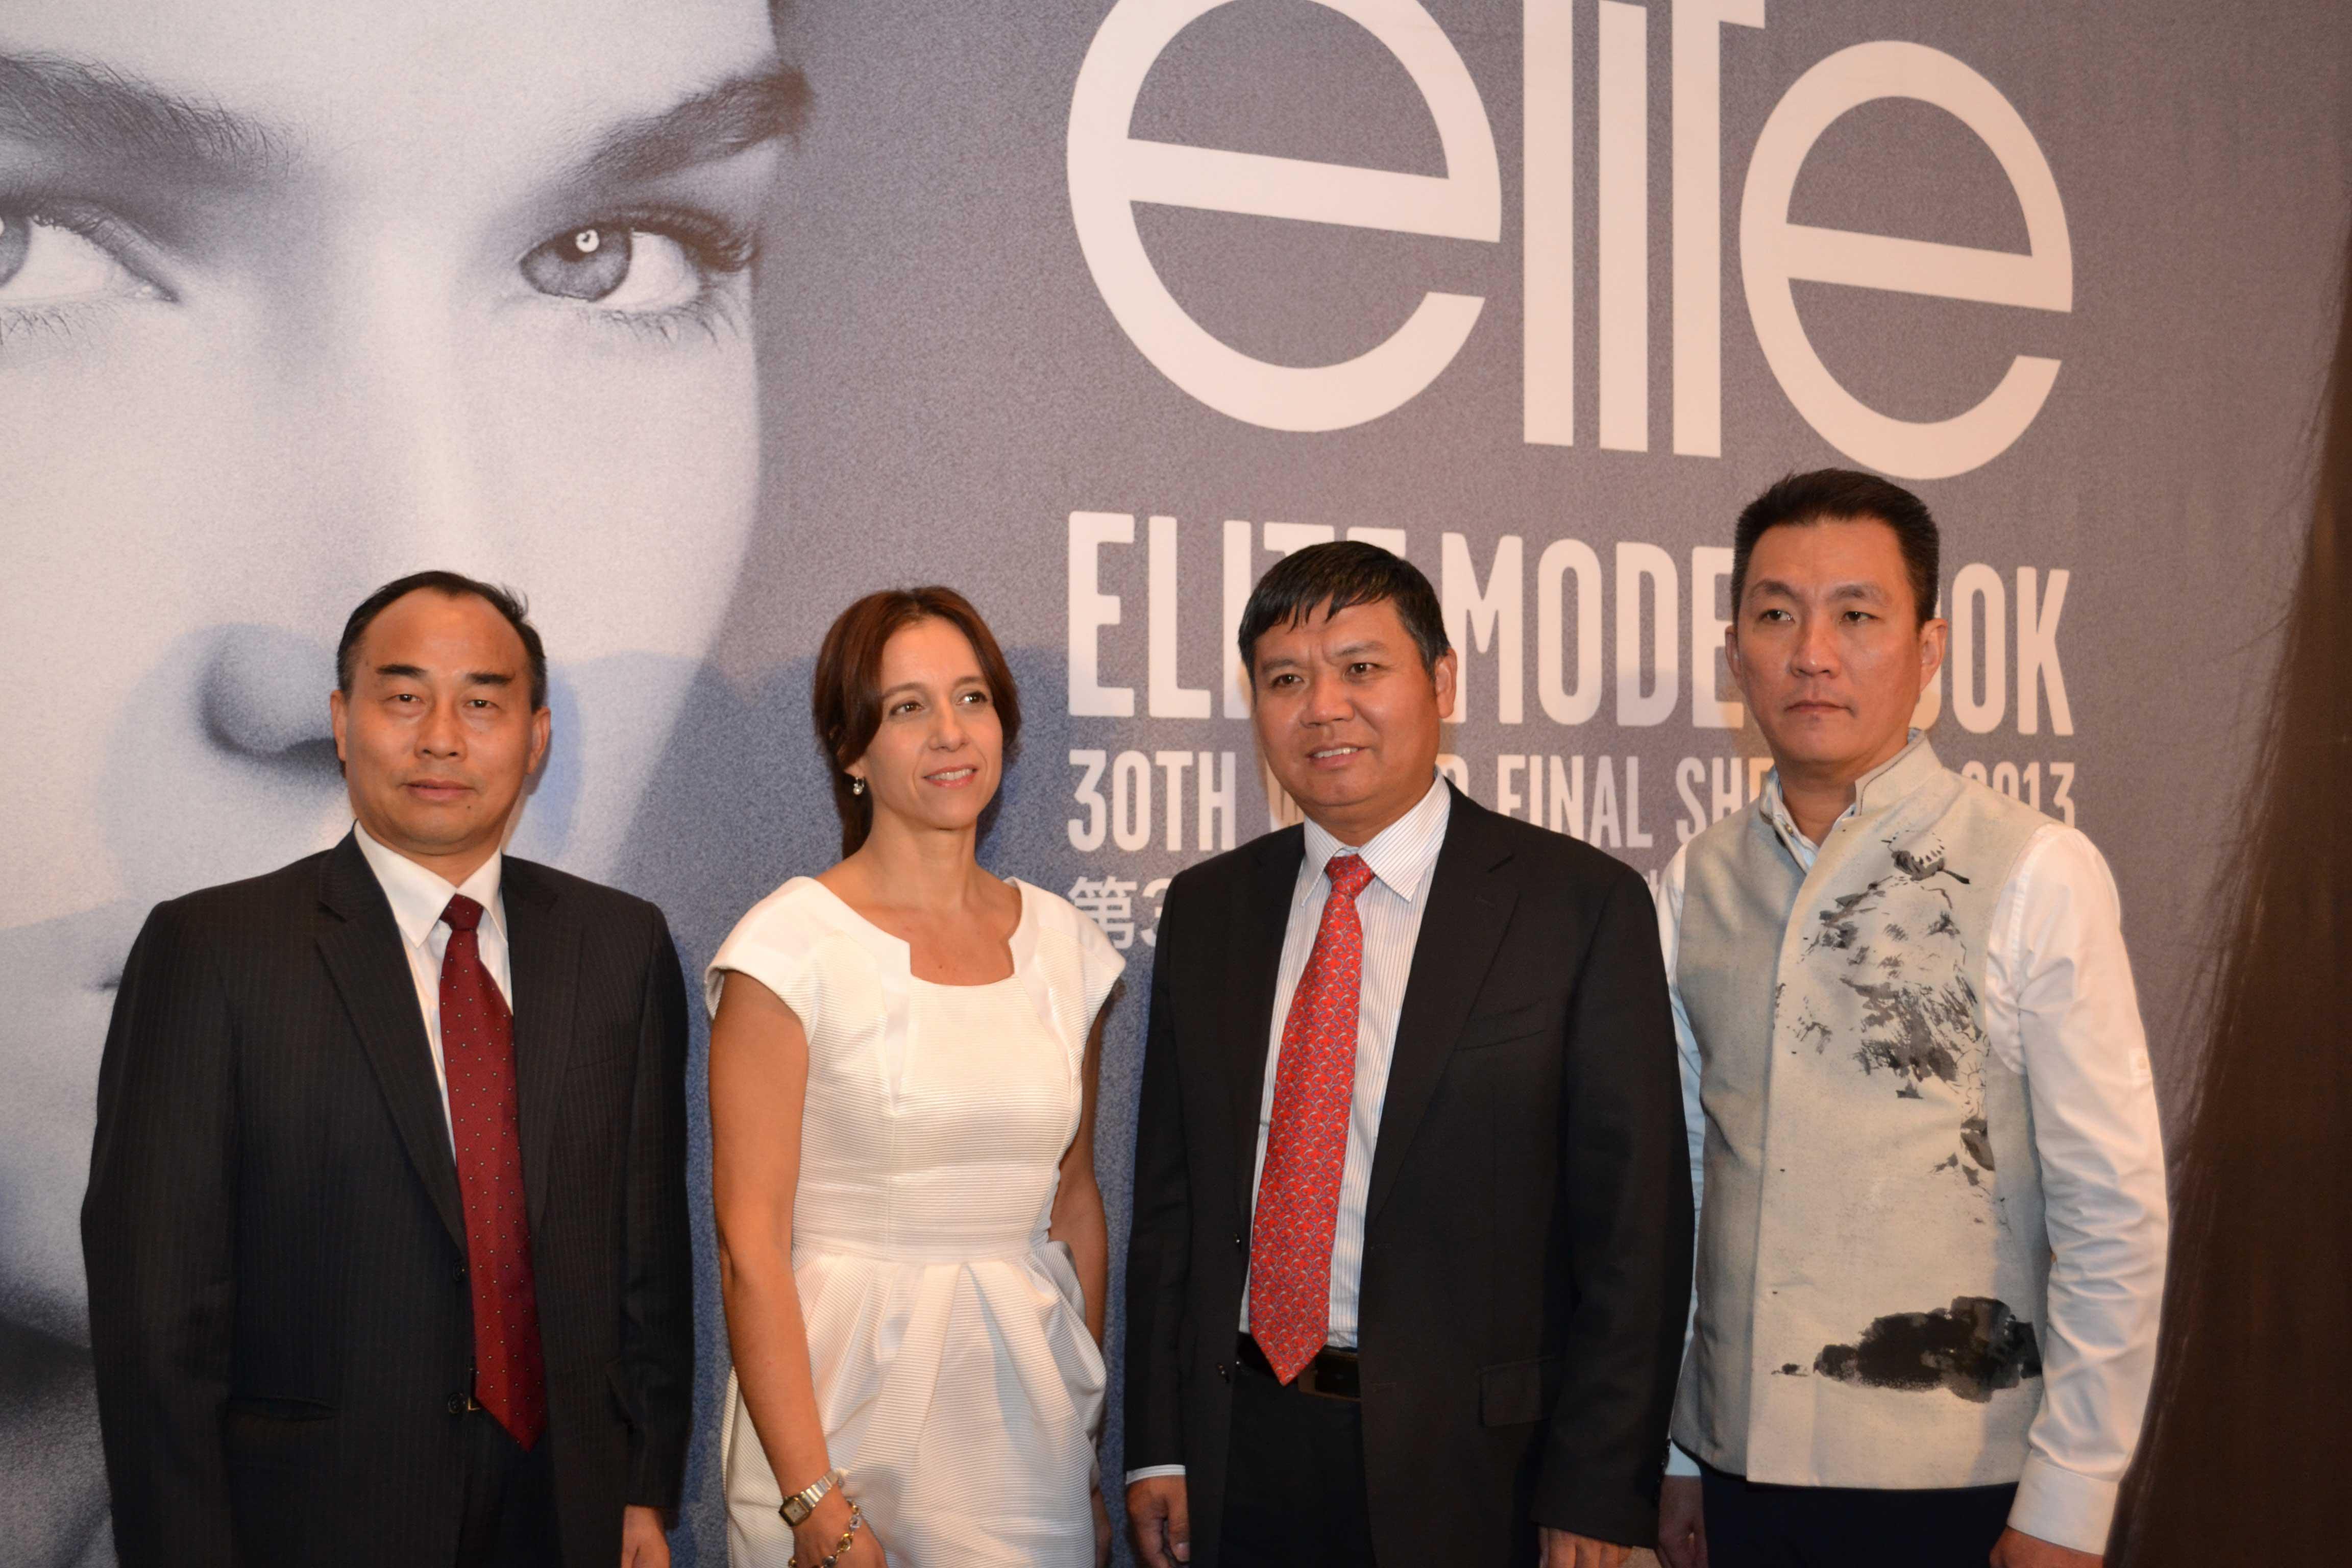 Elite Model Look à Shenzhen